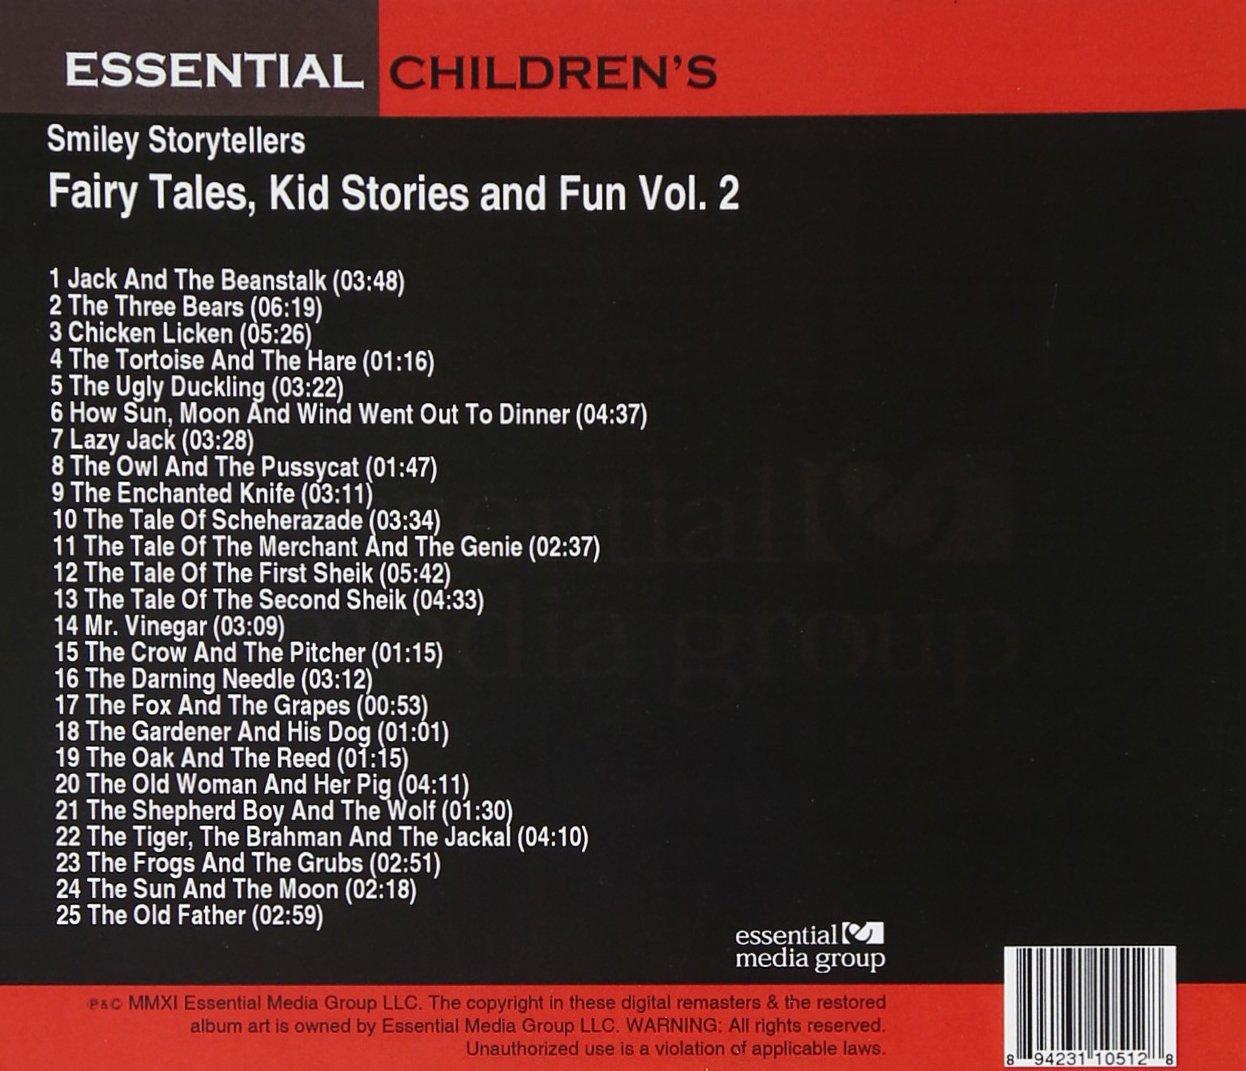 Fairy Tales, Kid Stories and Fun Vol. 2